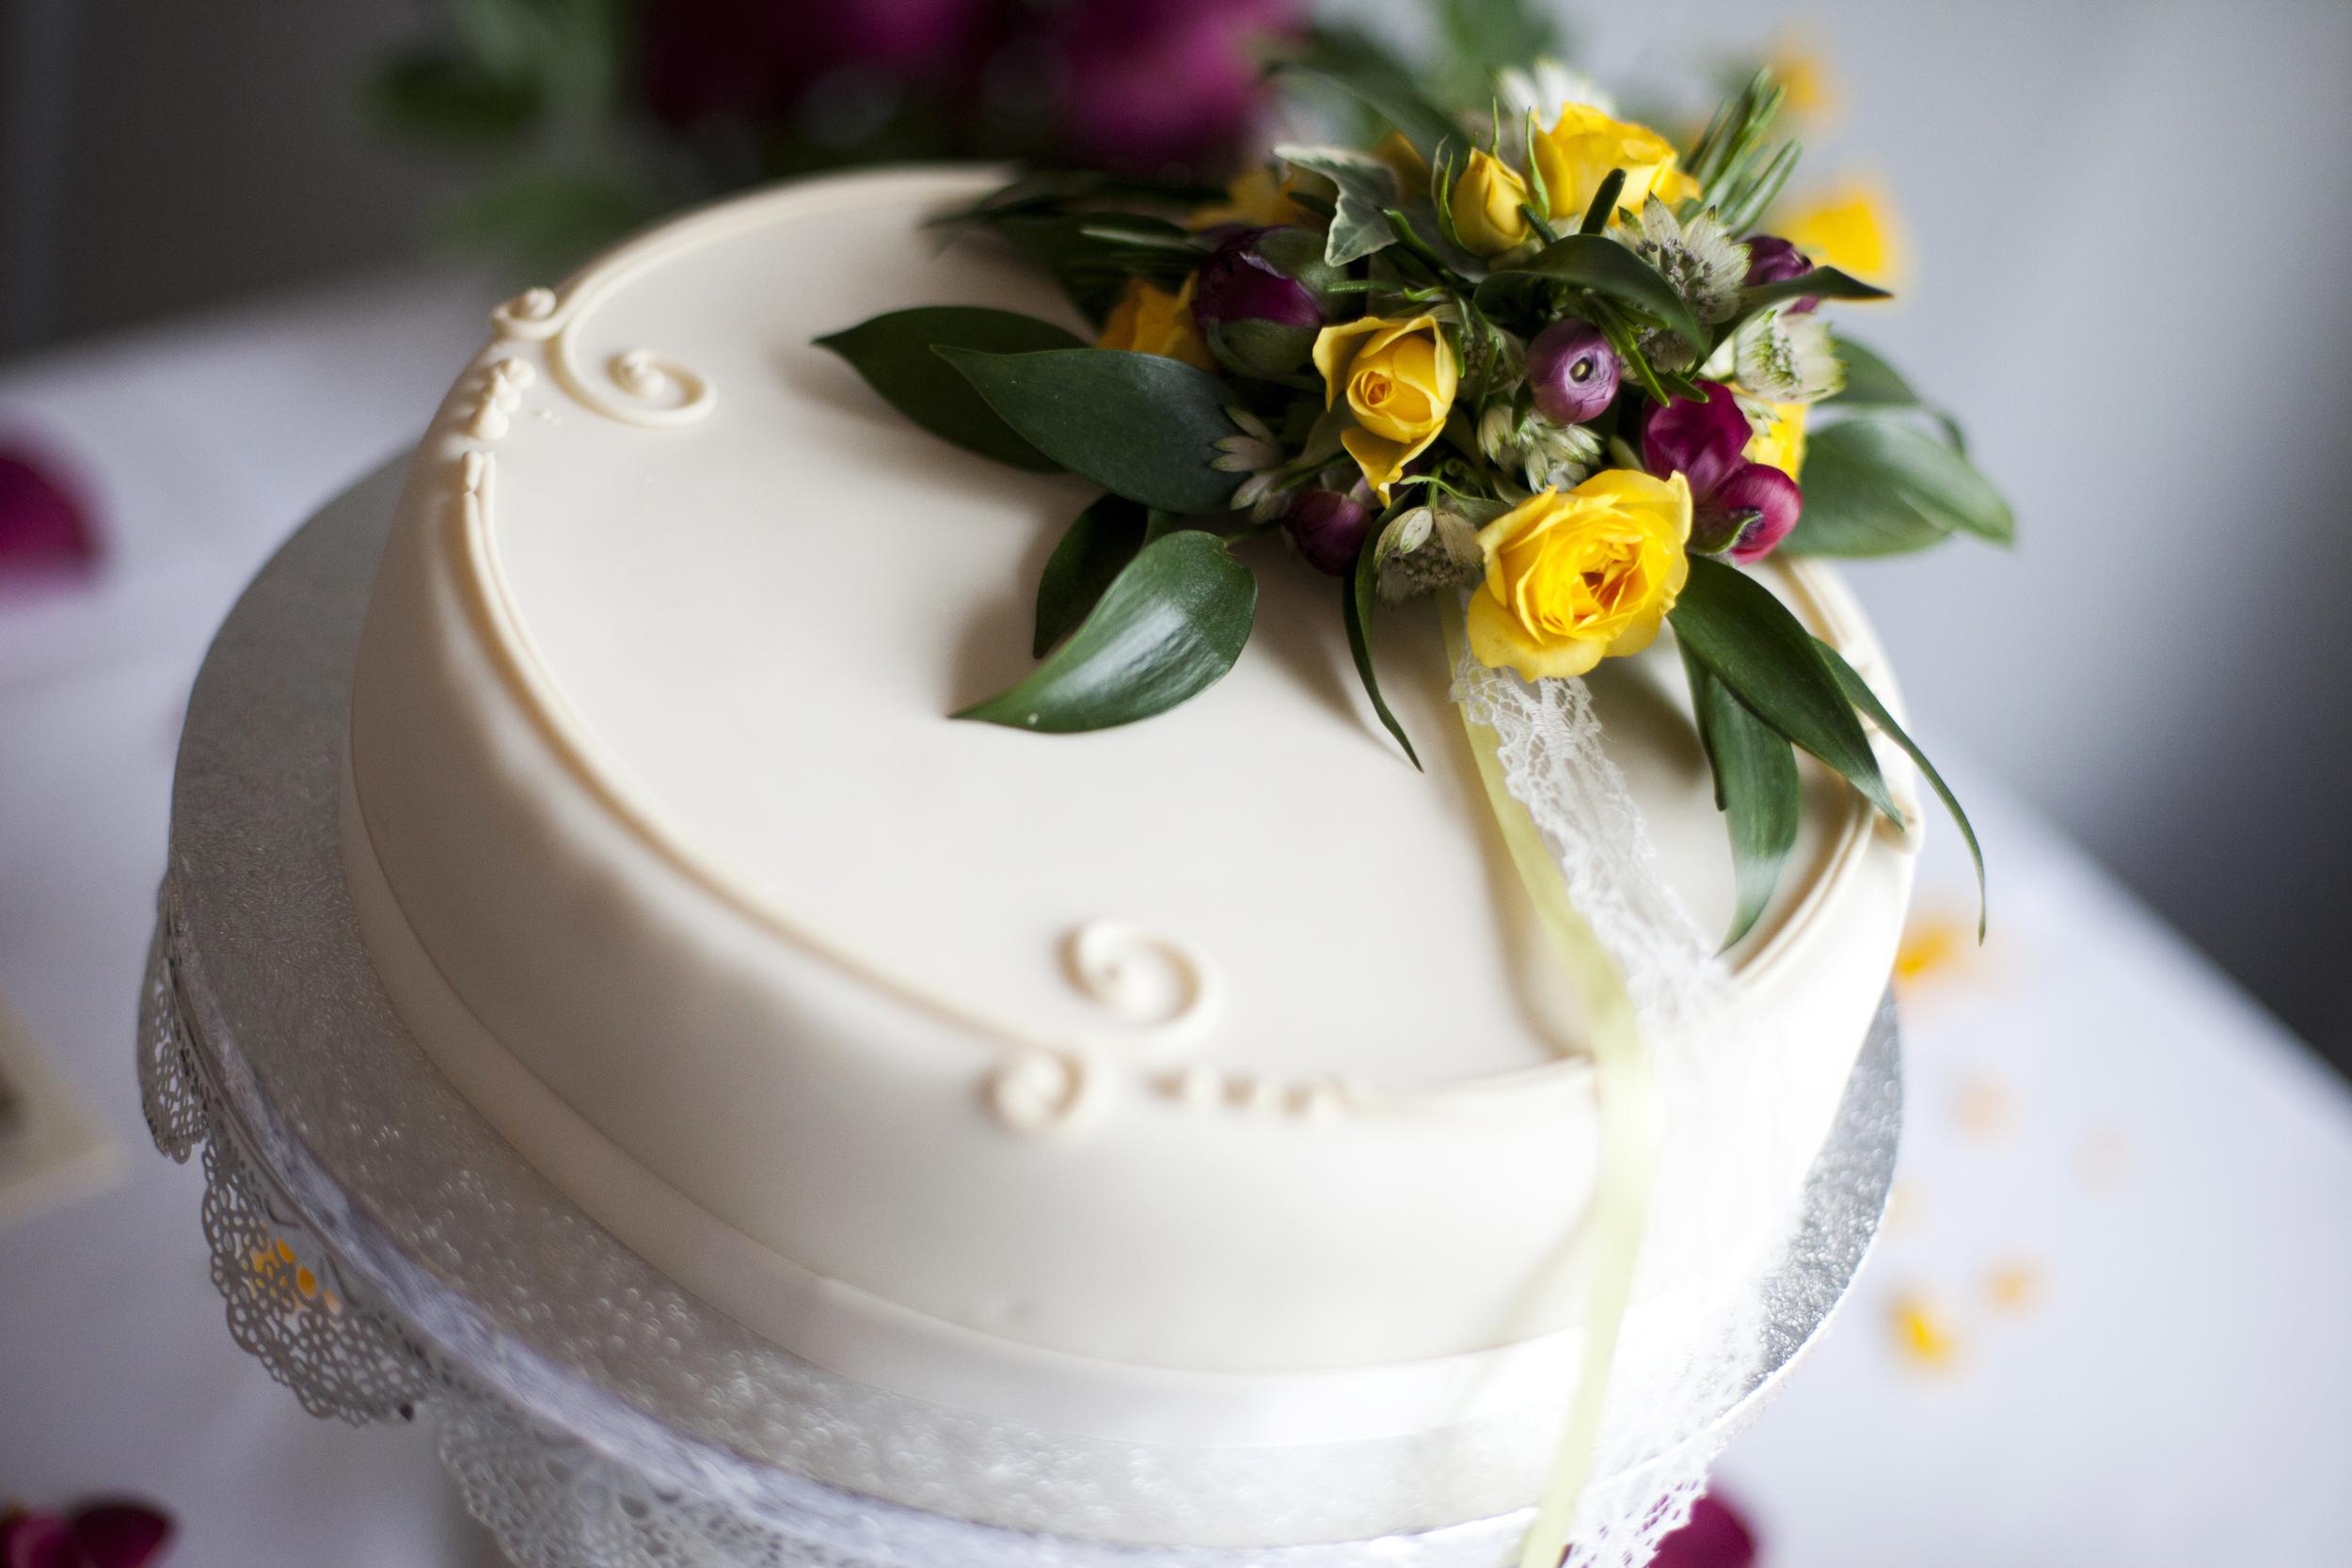 Cake flowers P&C.jpg